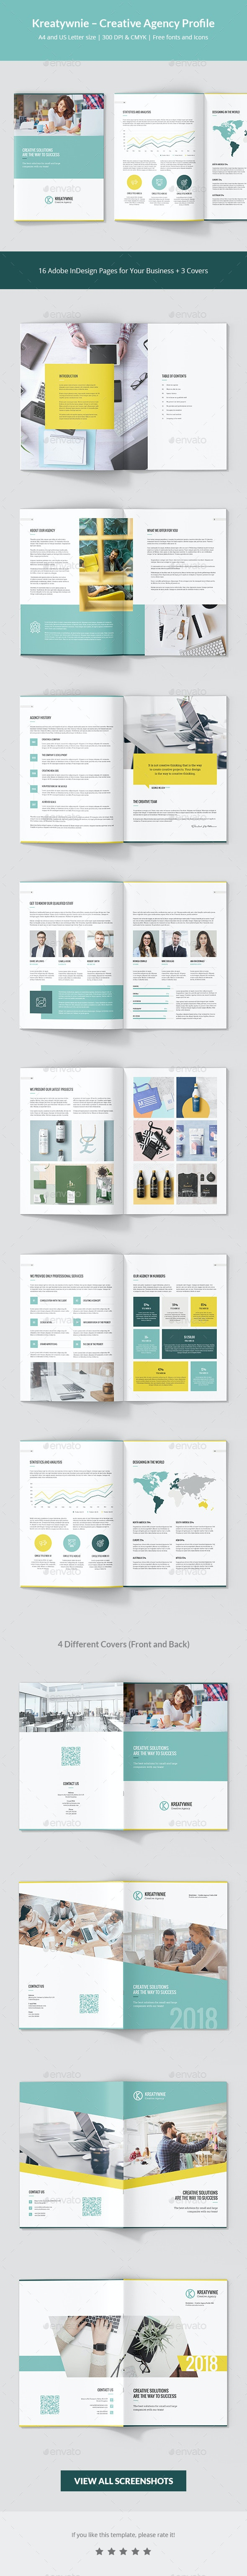 Kreatywnie – Creative Agency Profile - Corporate Brochures